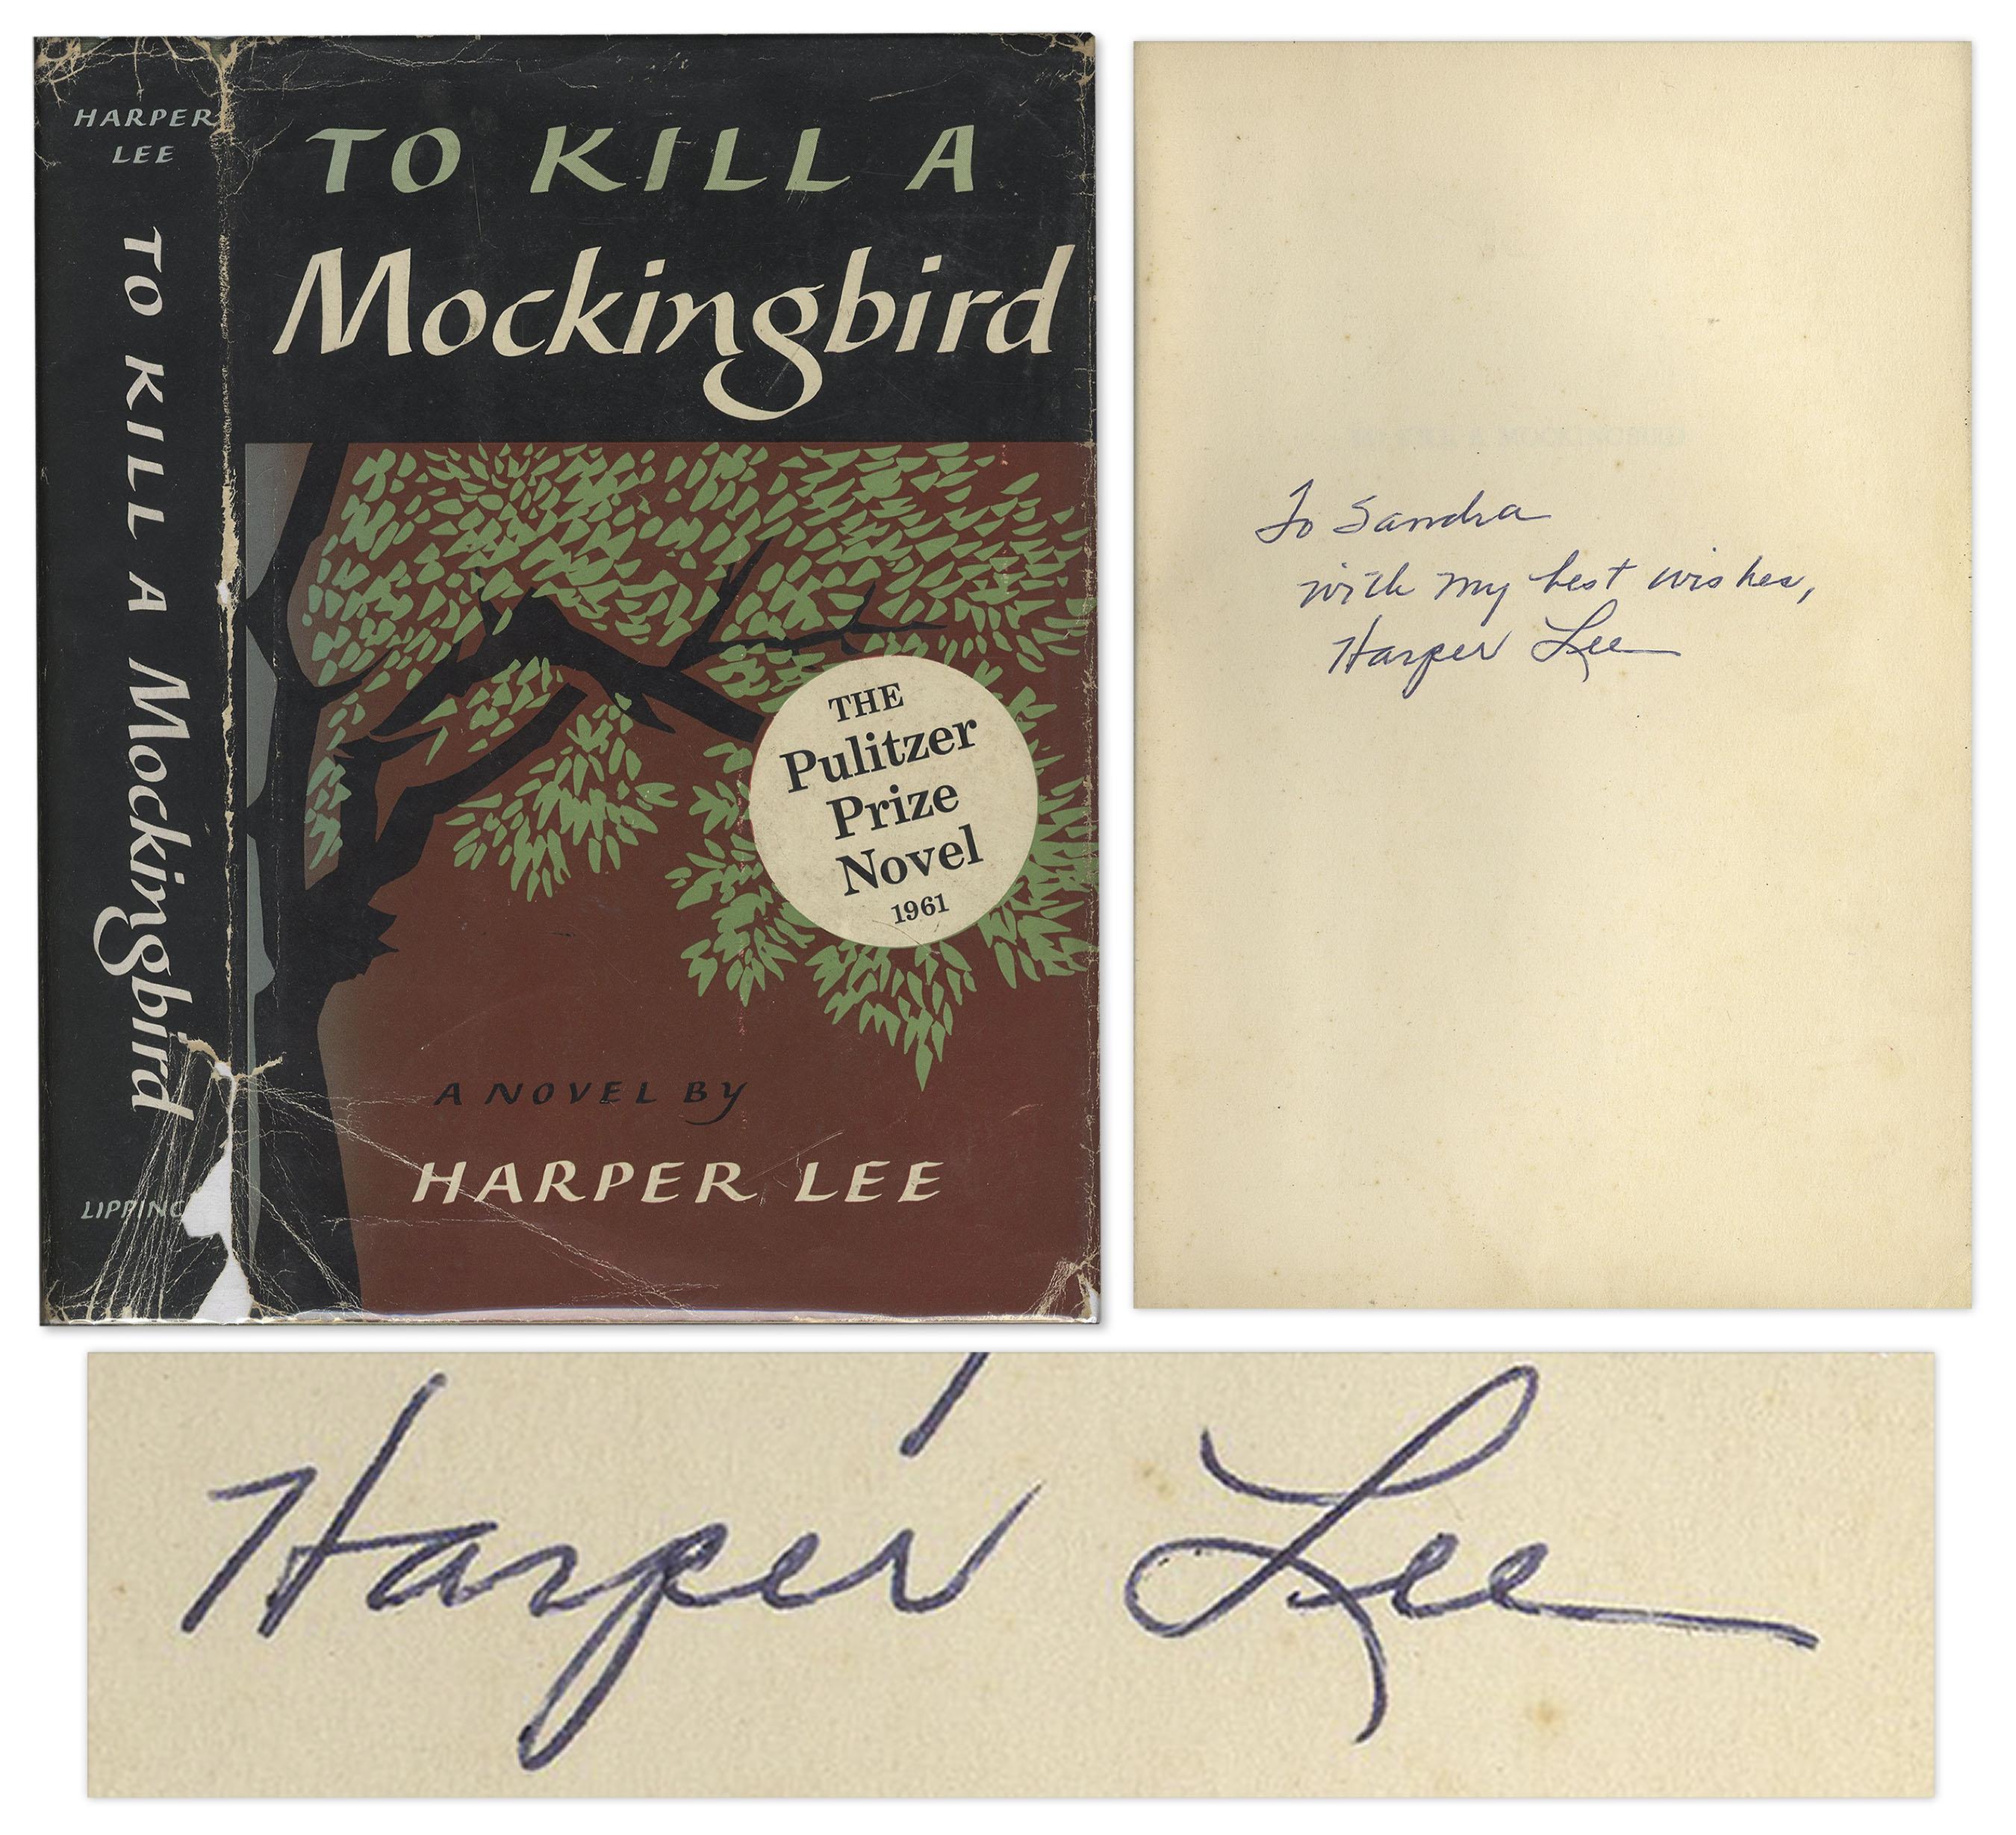 Lot Detail Harper Lee Signed 1960 First Edition Eleventh